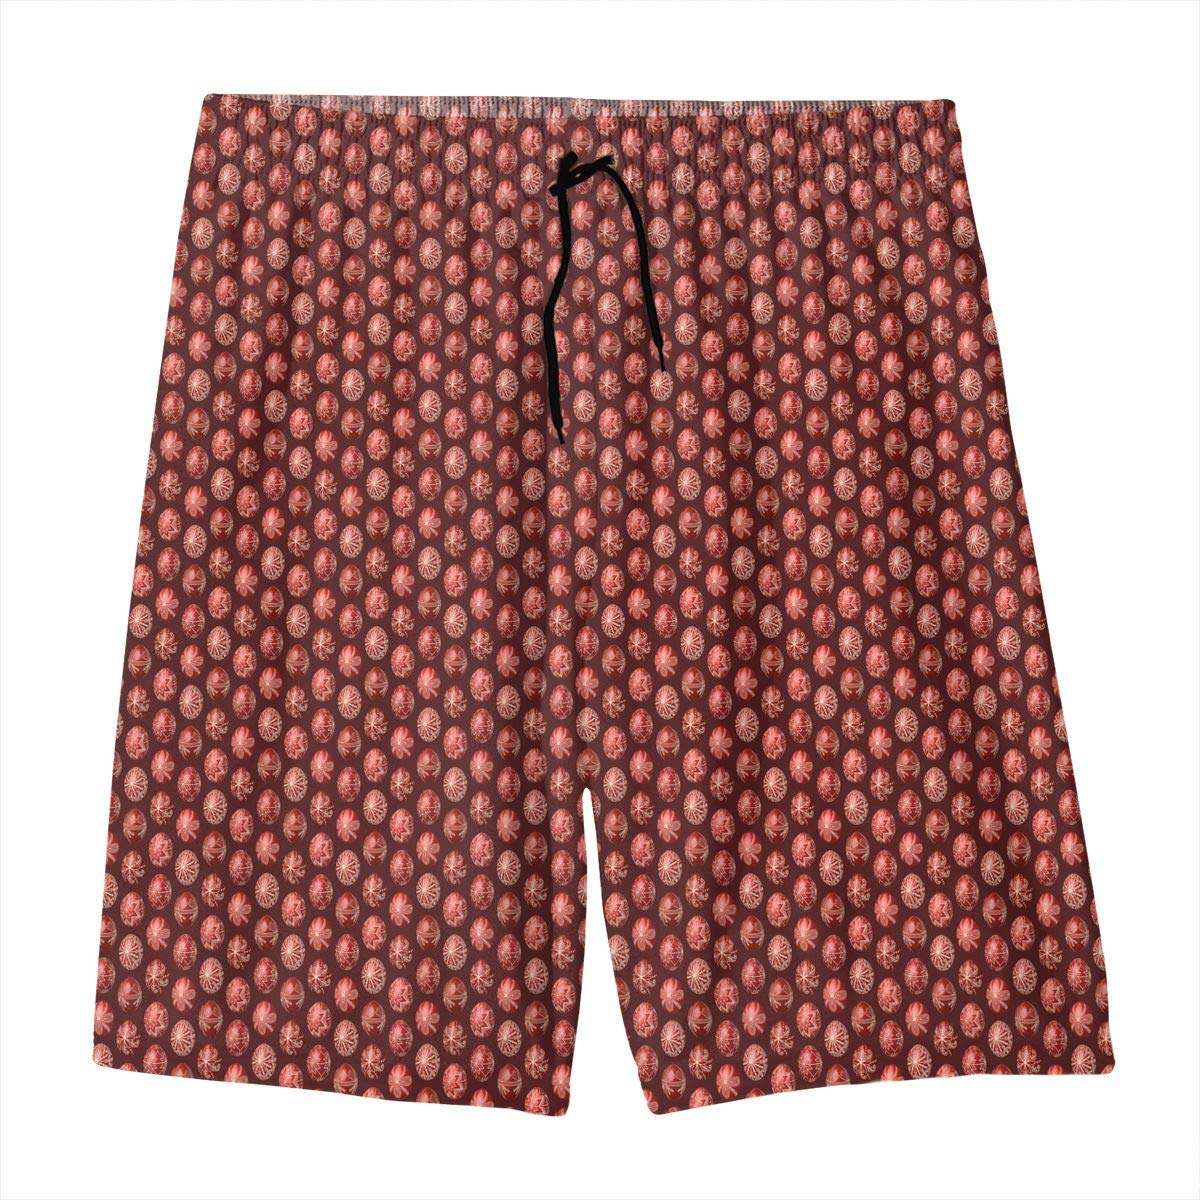 3D-red-pysanka-Middle Teen Swim Trunks Bathing Suit Shorts Board Beach